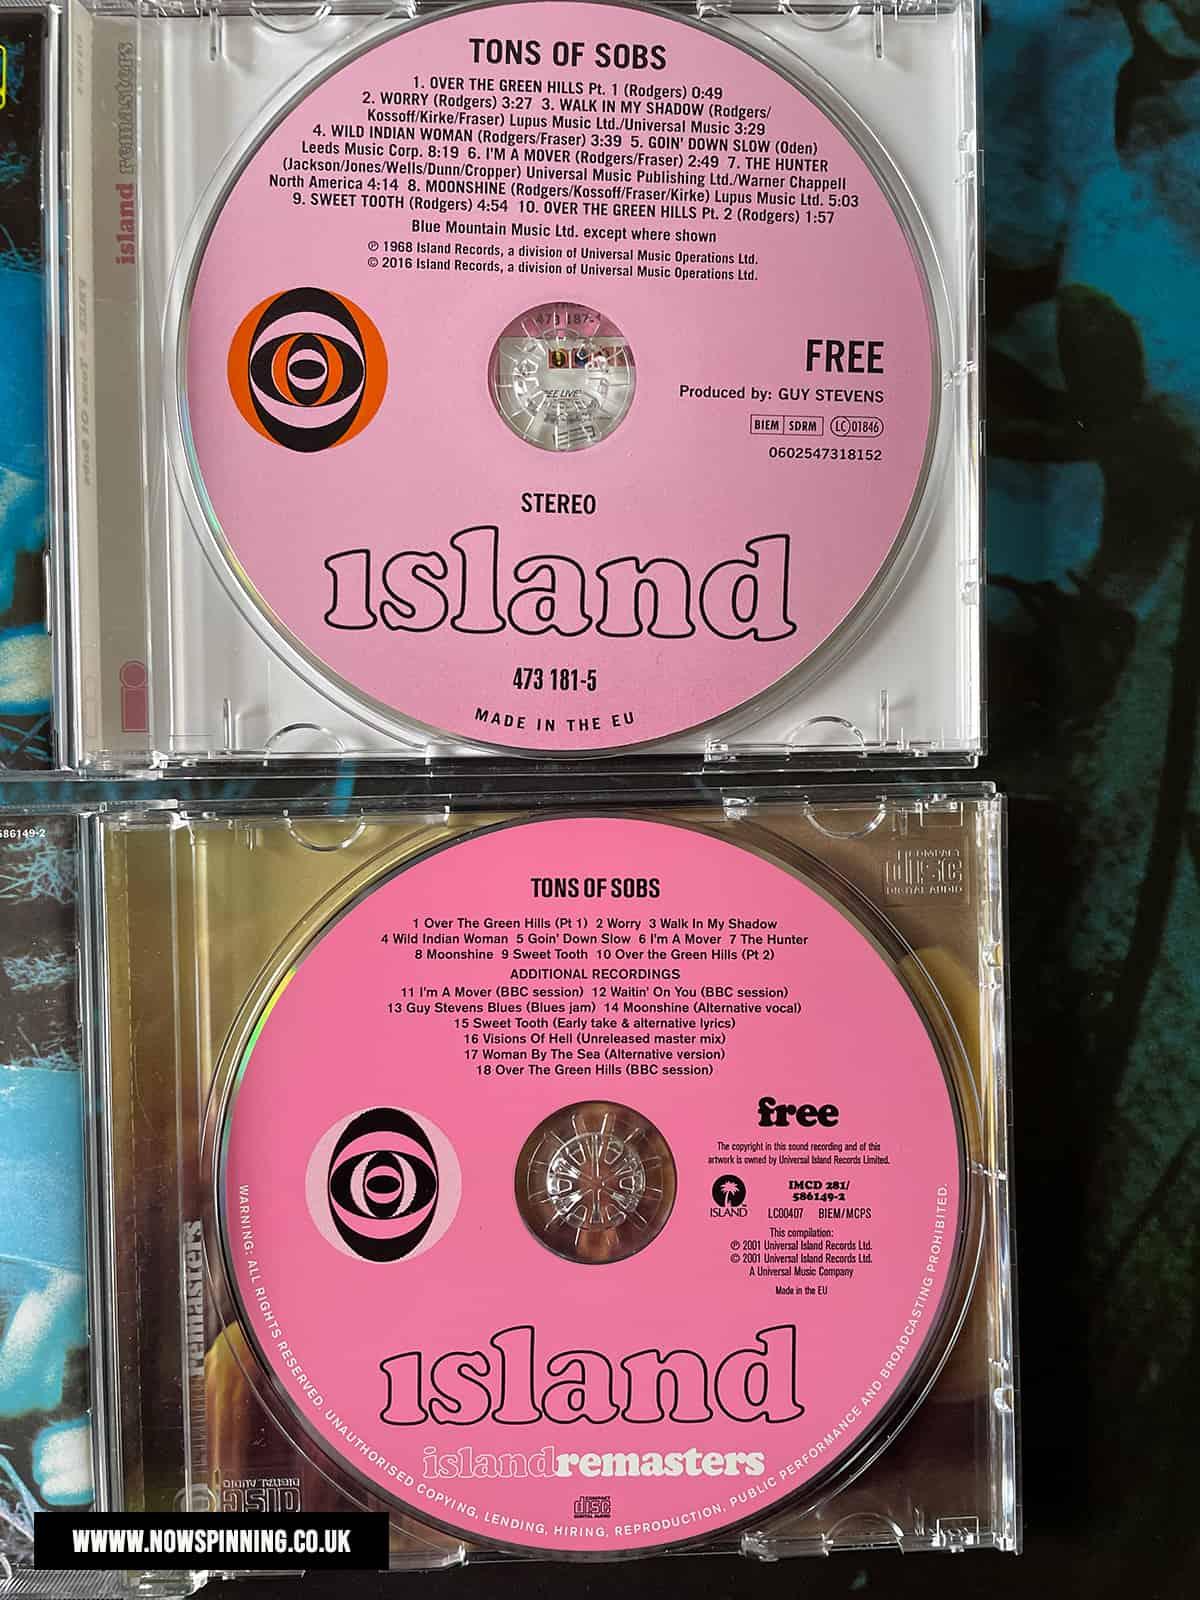 Free Tons of Sobs CD Ramaster